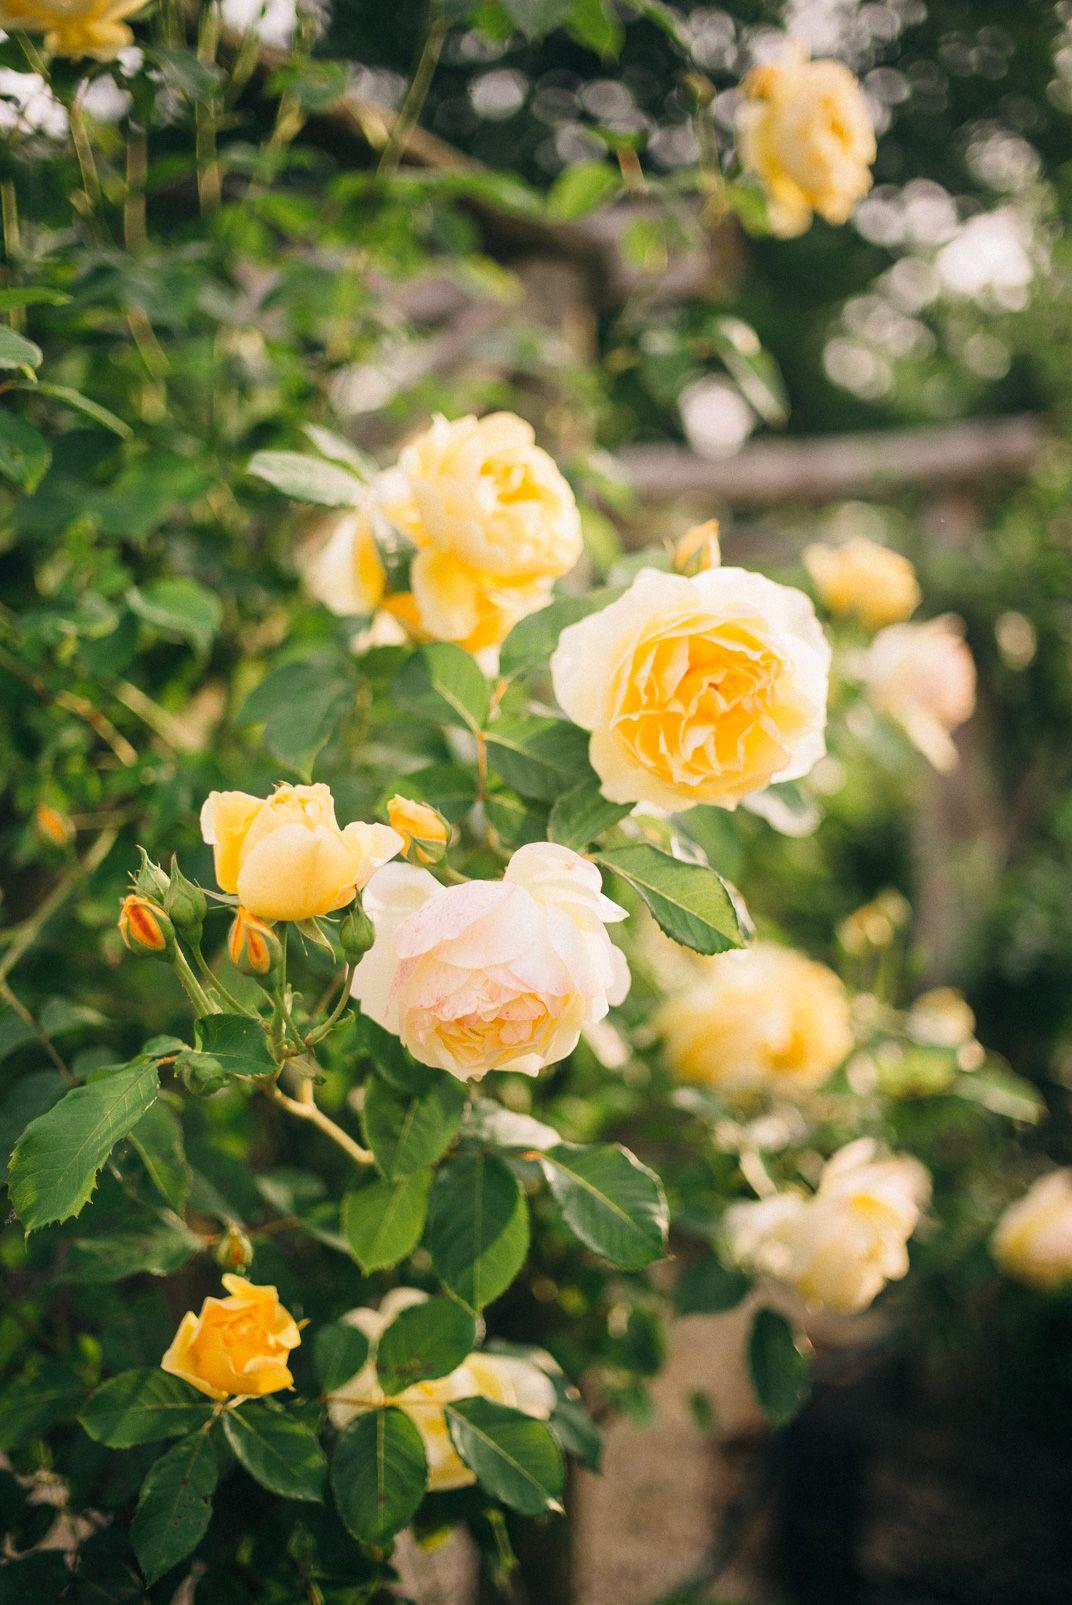 Snaps from an english garden pinterest english gardens yellow snaps from an english garden lucy cuneo mightylinksfo